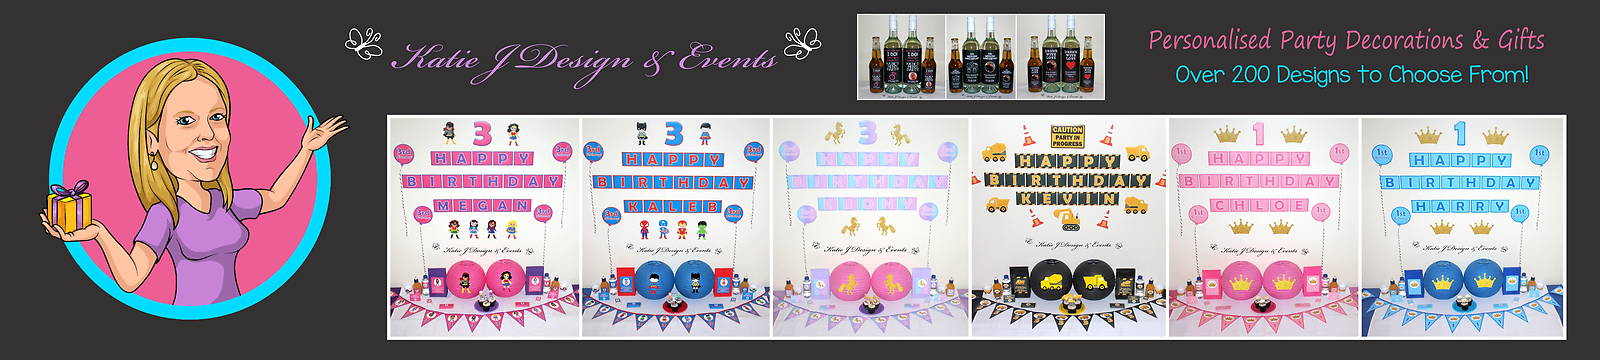 Katie J Design And Events